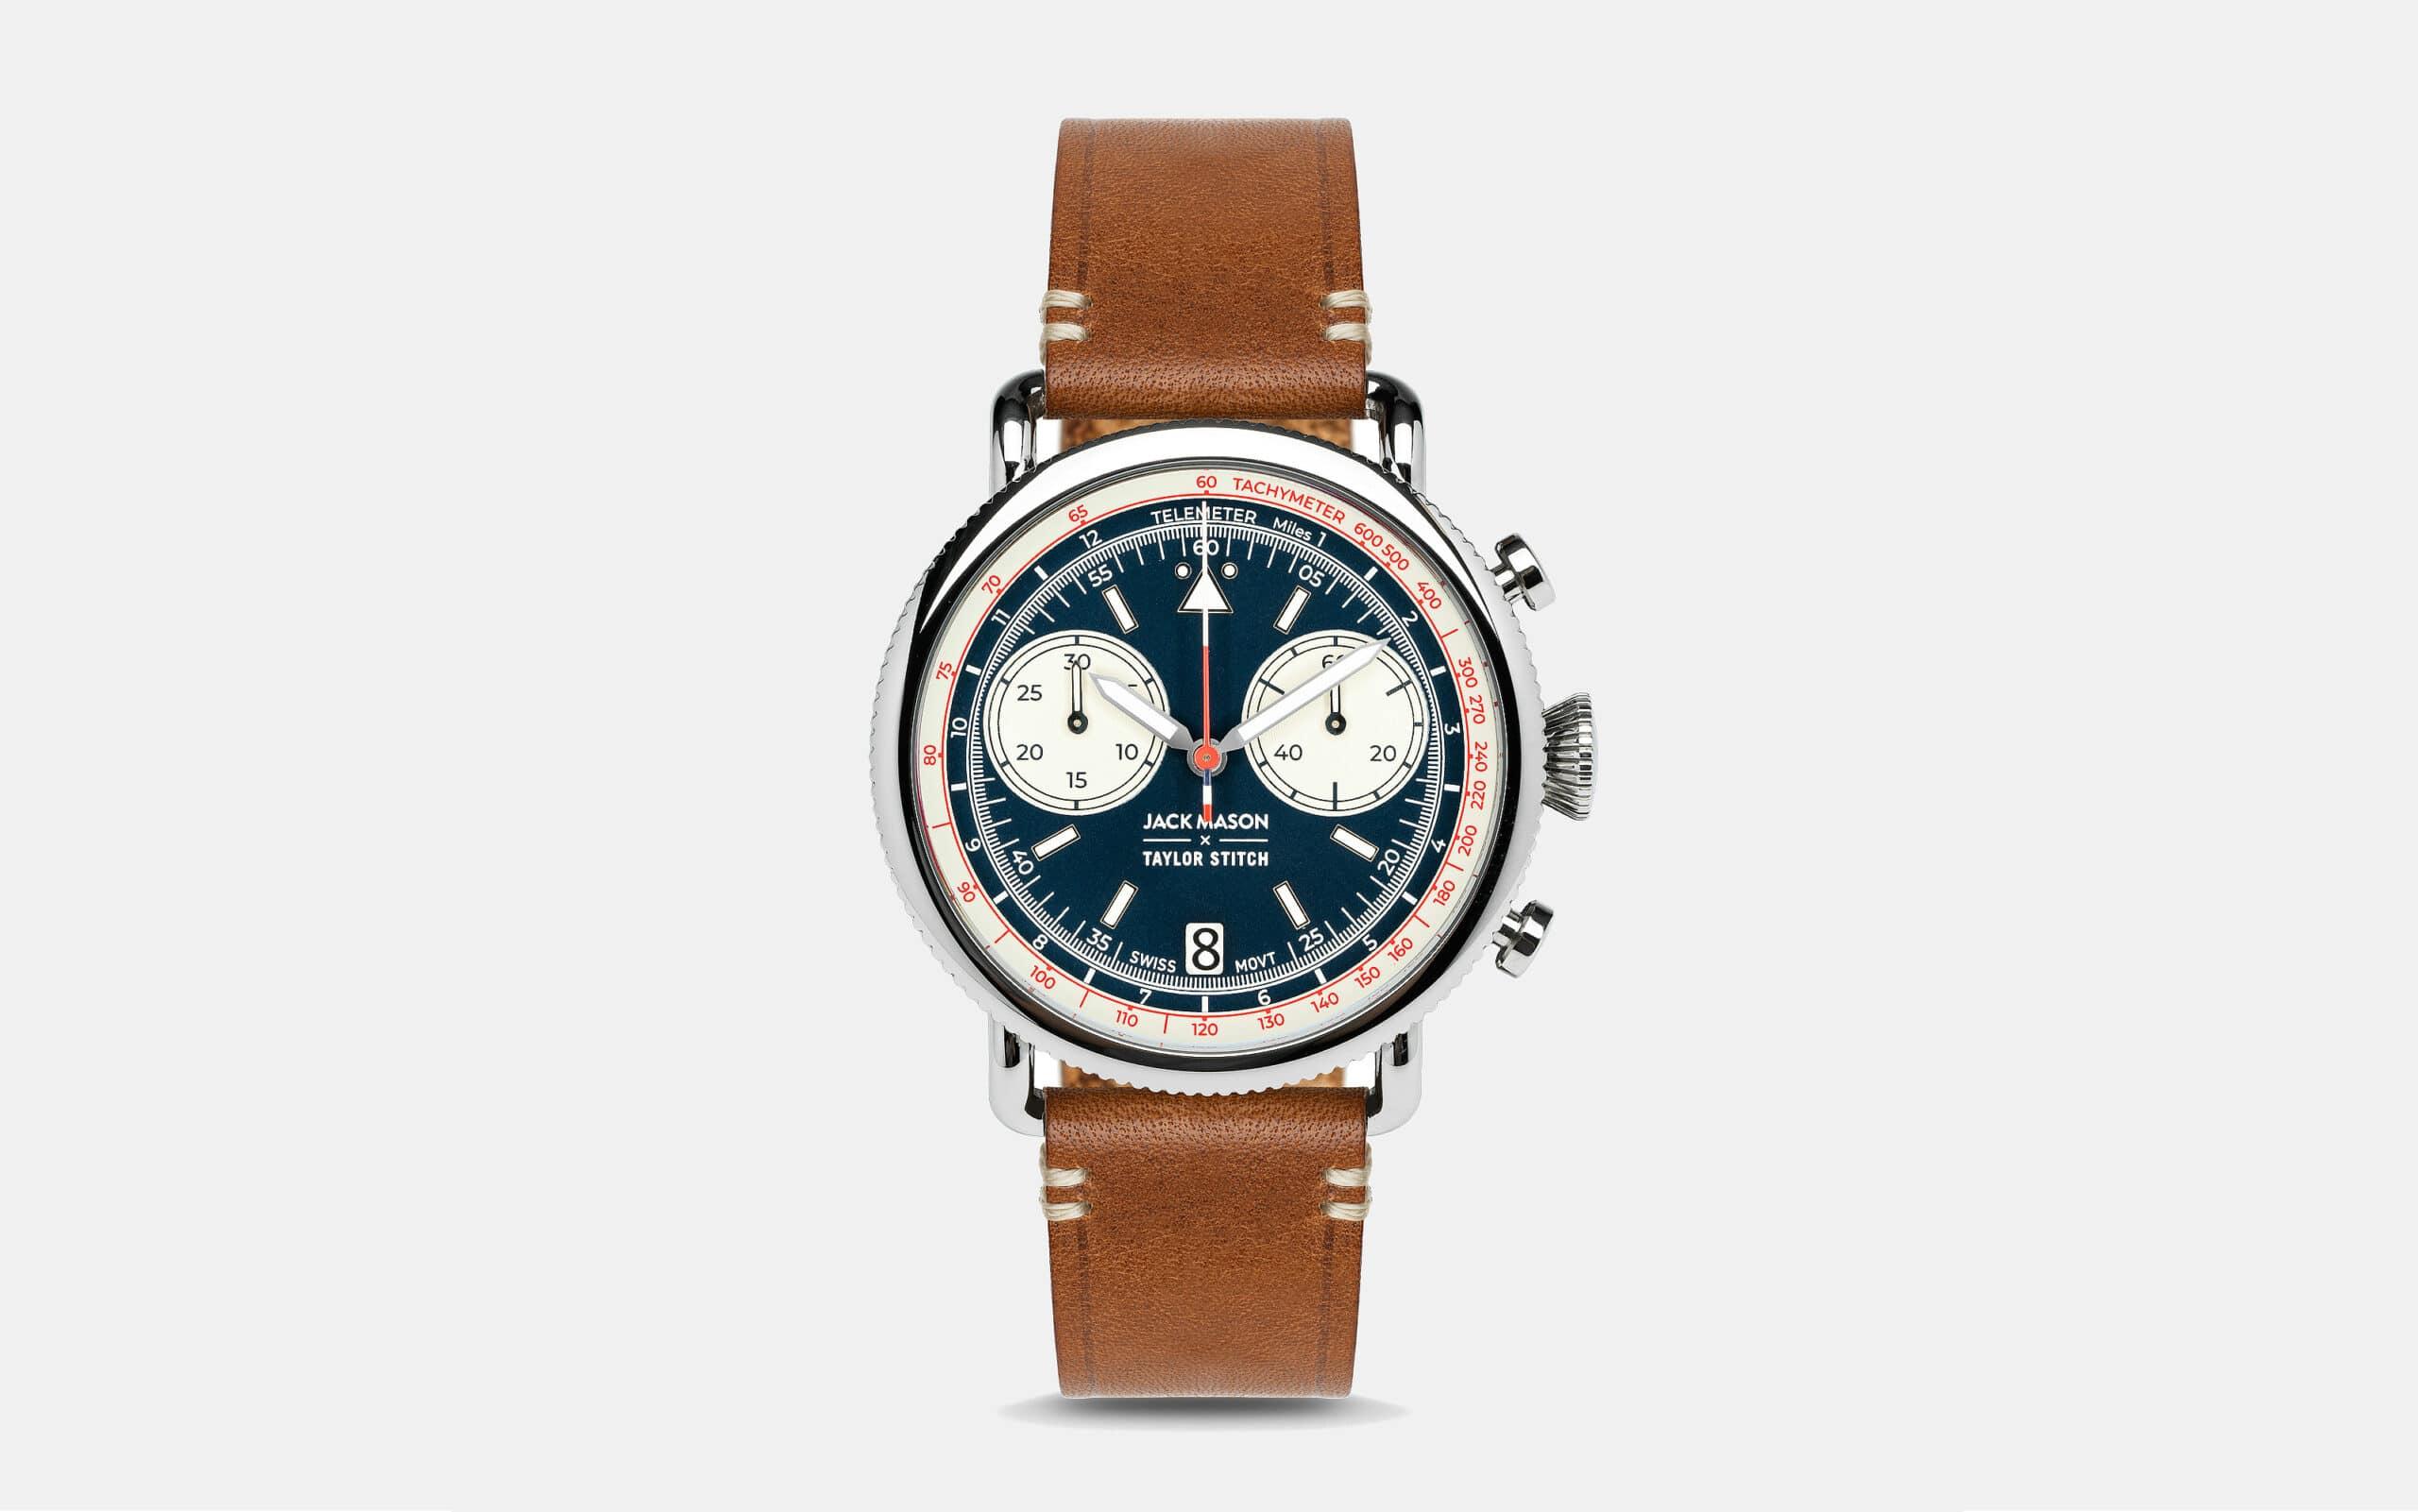 Jack Mason x Taylor Stitch Aviator Multi‑Scale Chronograph